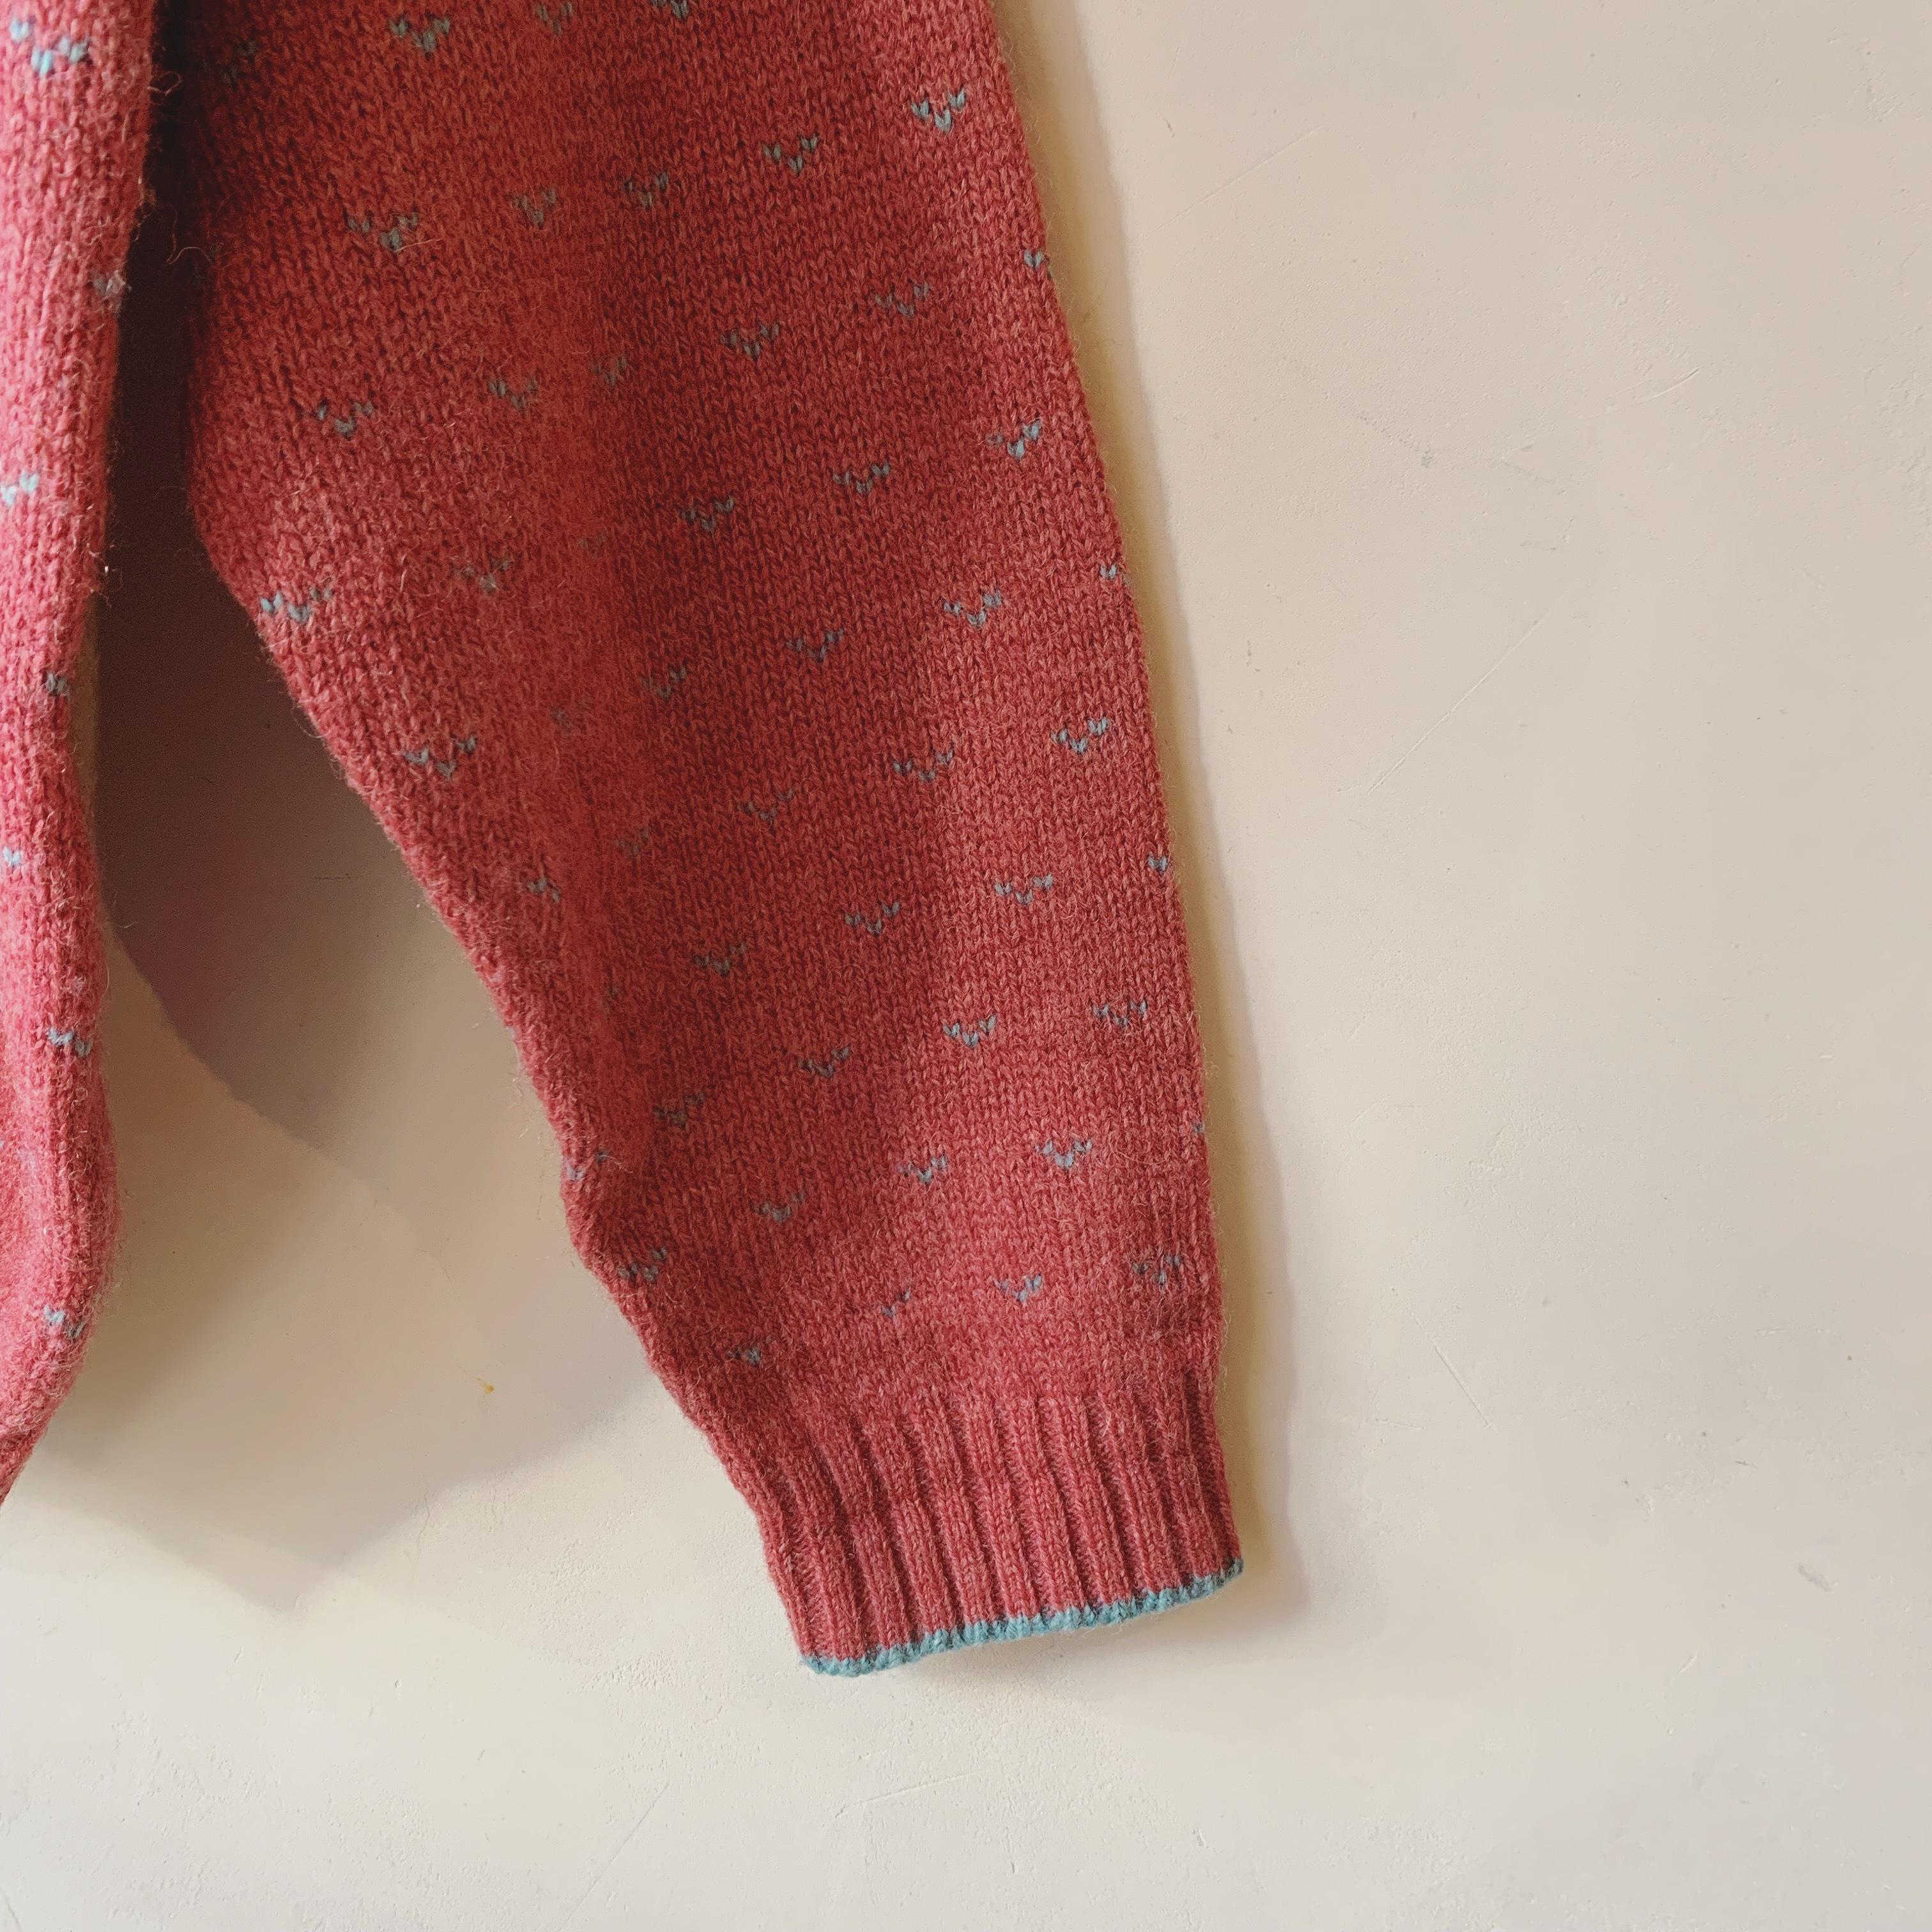 vintage smokypink knit cardigan